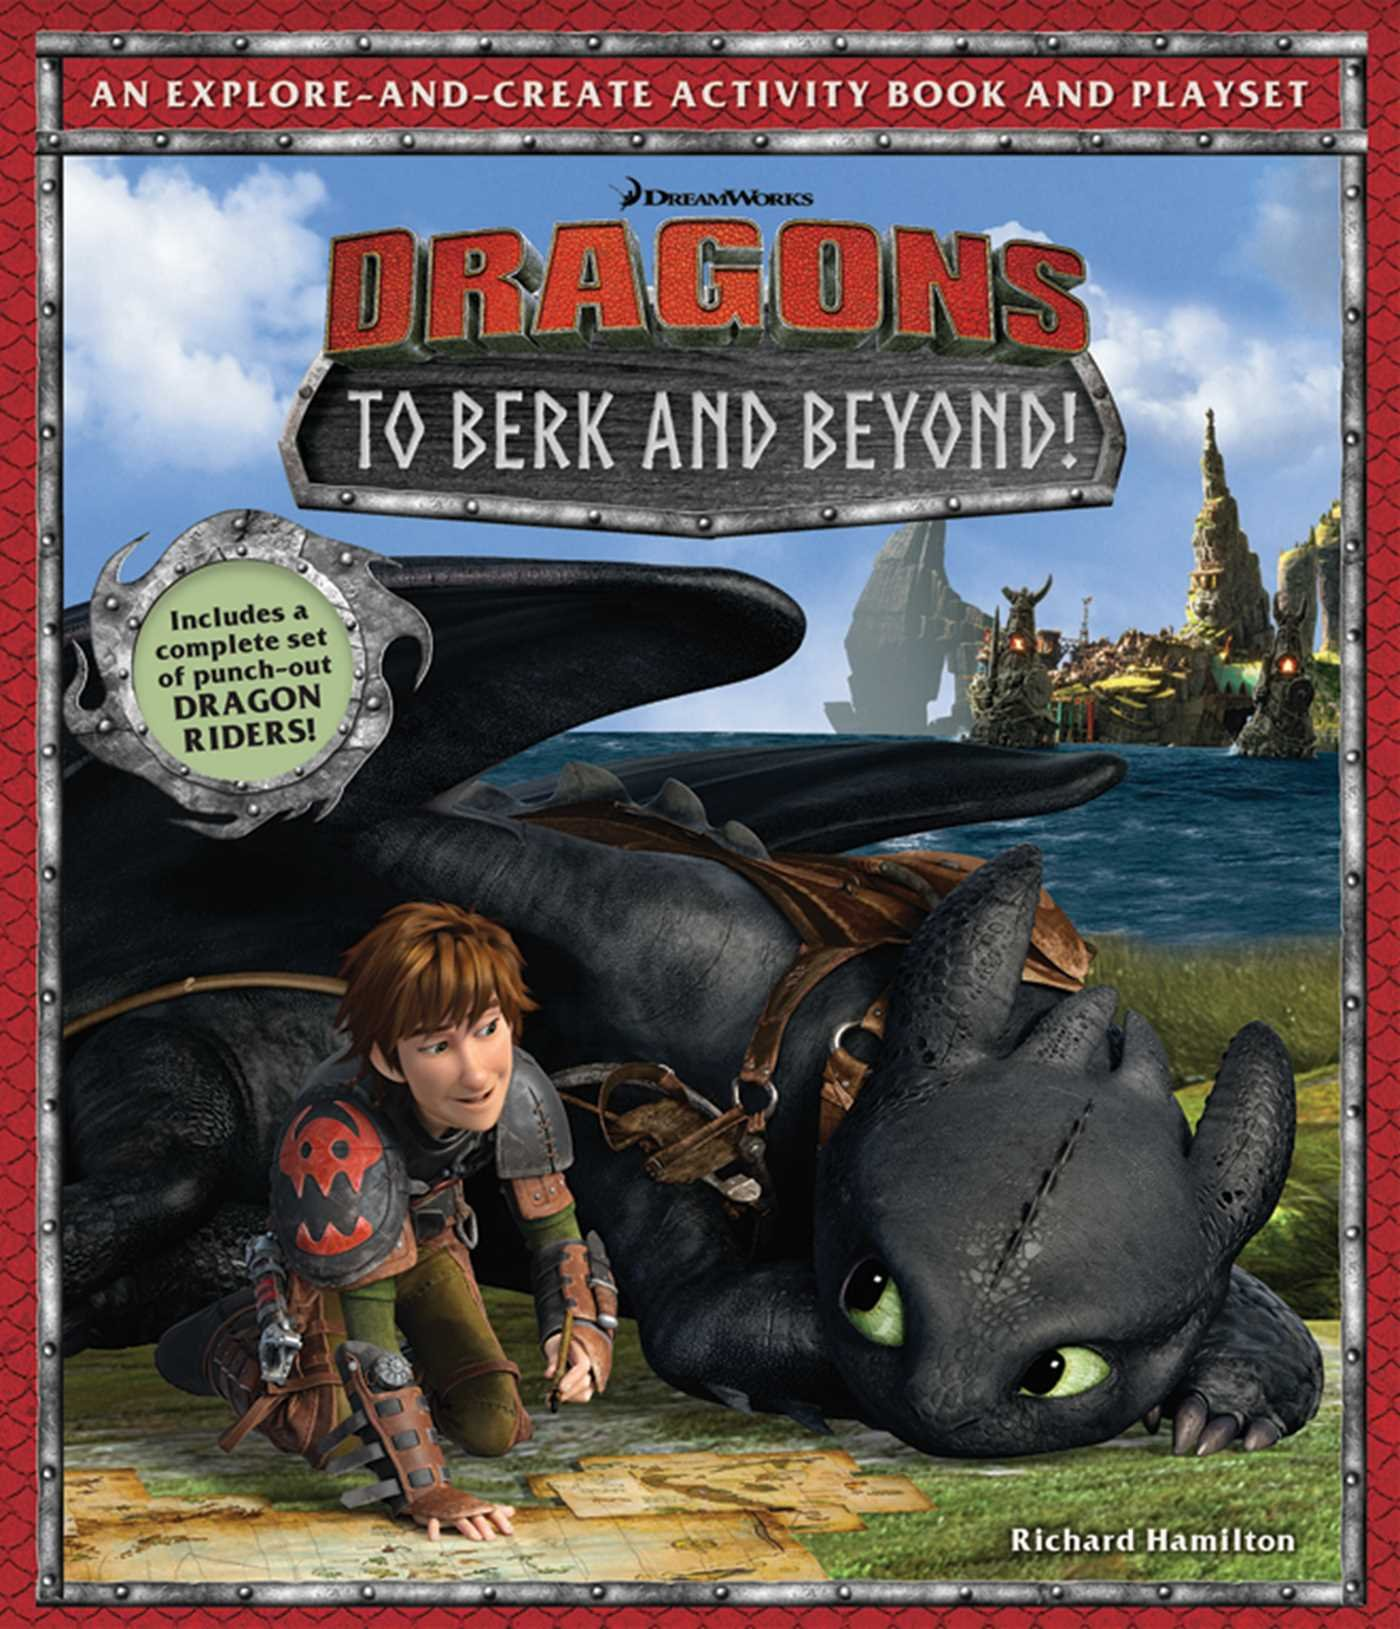 Amazon: Dreamworks Dragons: To Berk And Beyond!: An Exploreandcreate  Activity Book And Play Set (9781608876815): Richard Hamilton: Books